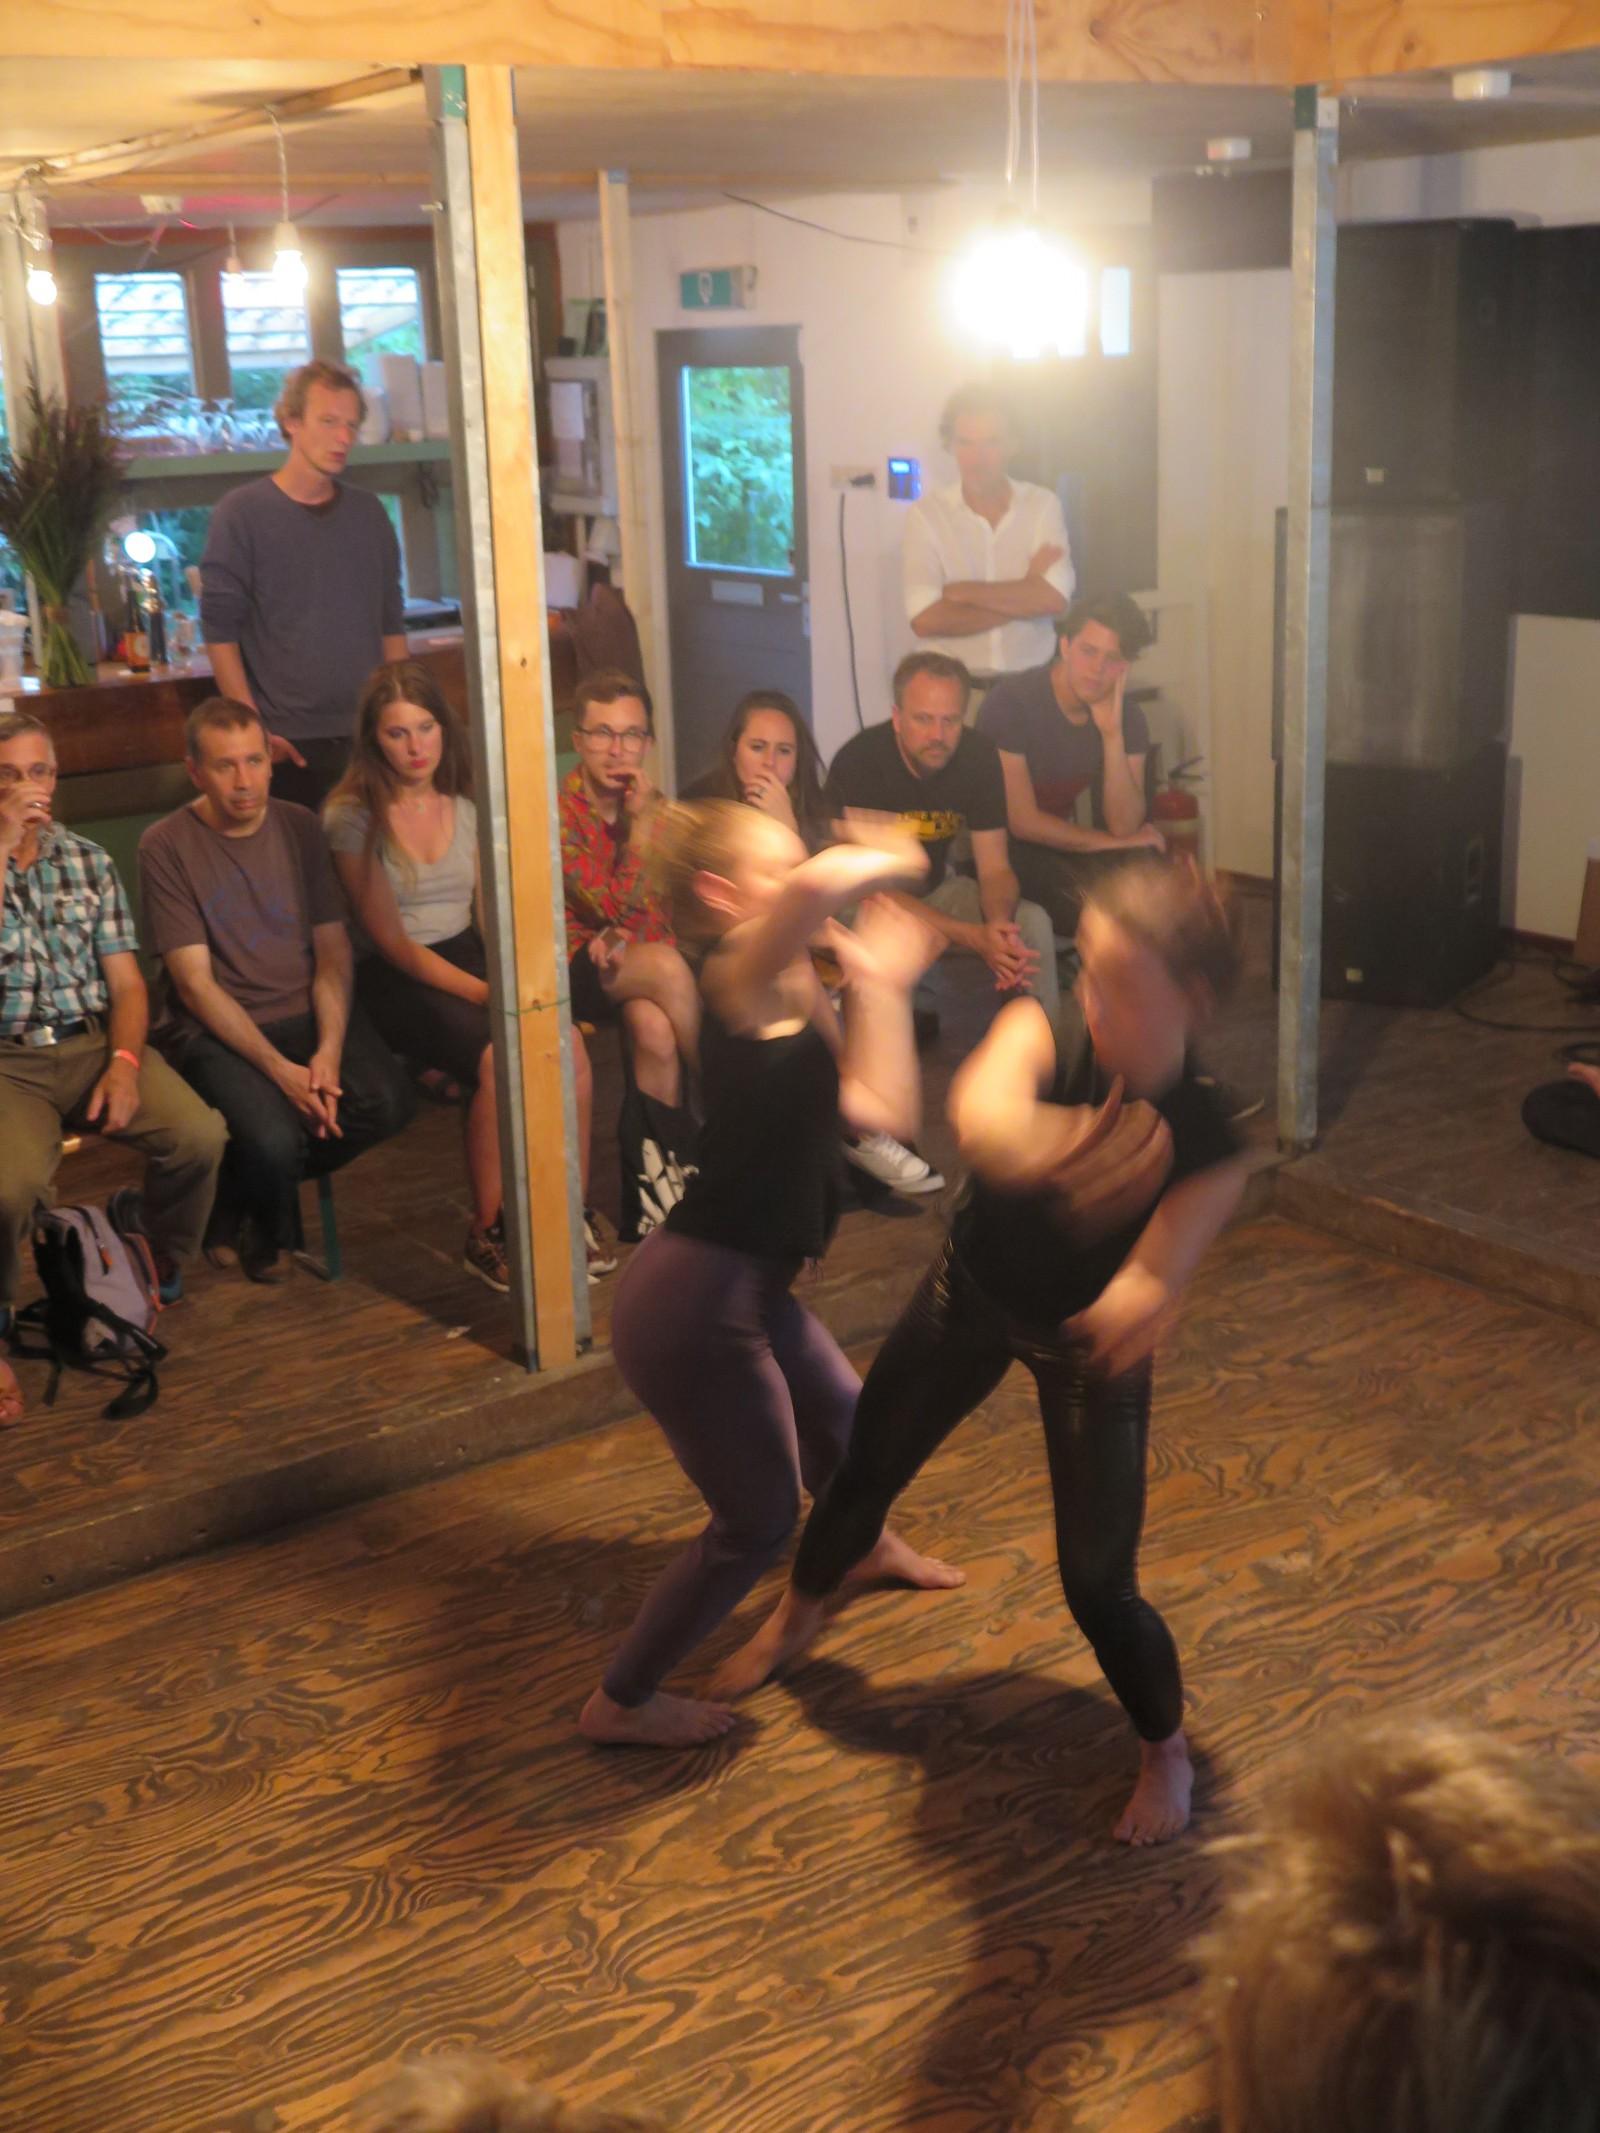 Tryout Trigger, choreografie: Lait Waysbort